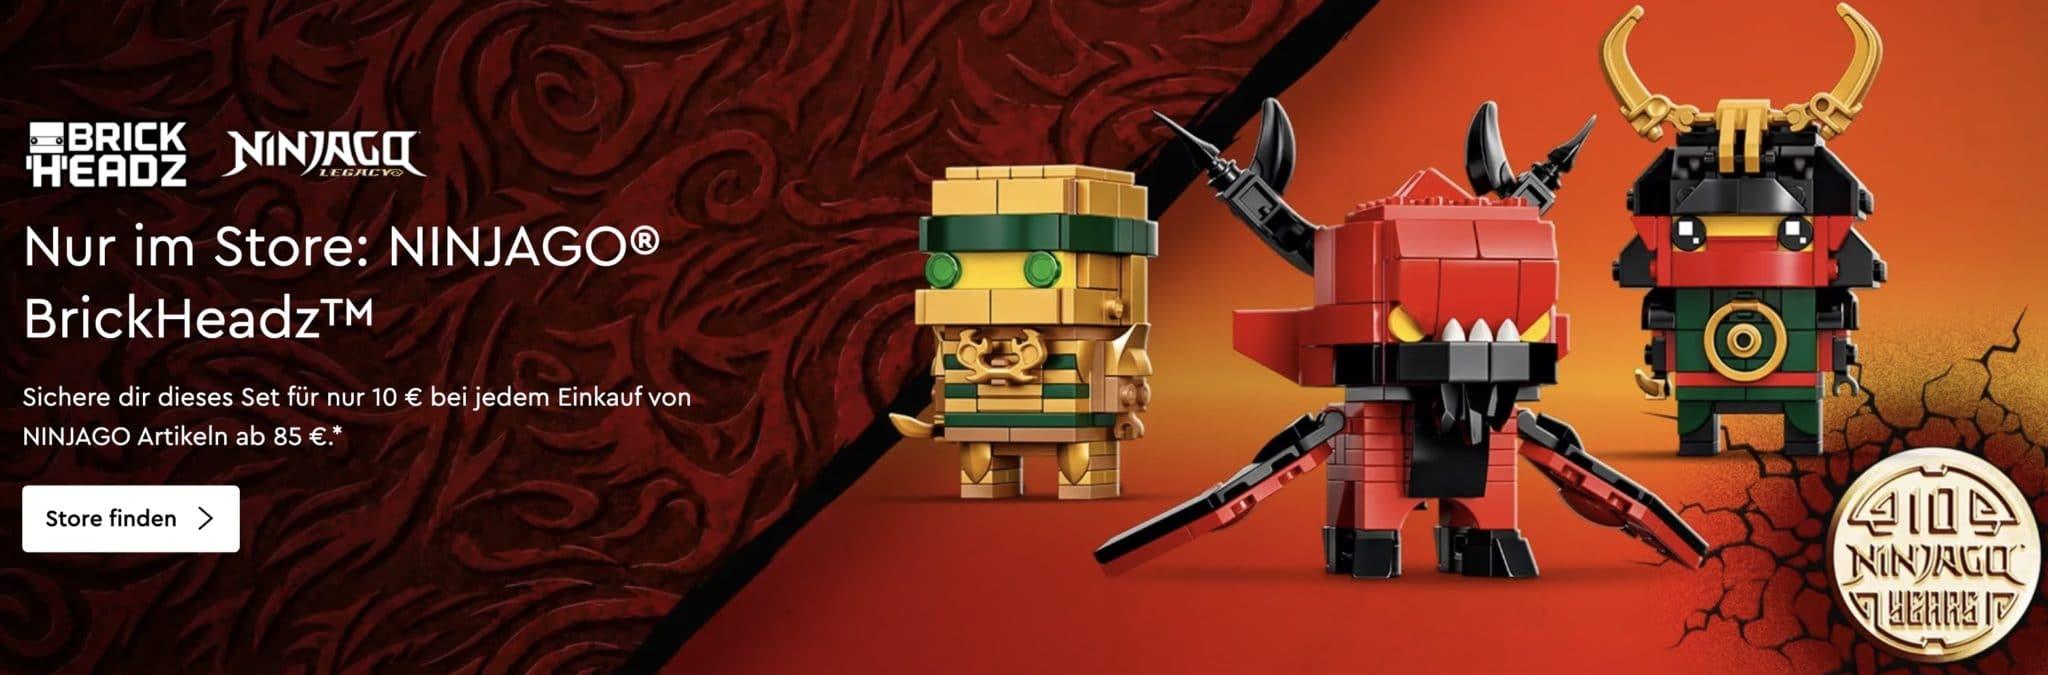 LEGO 40490 Ninjago Brickheadz Aktion